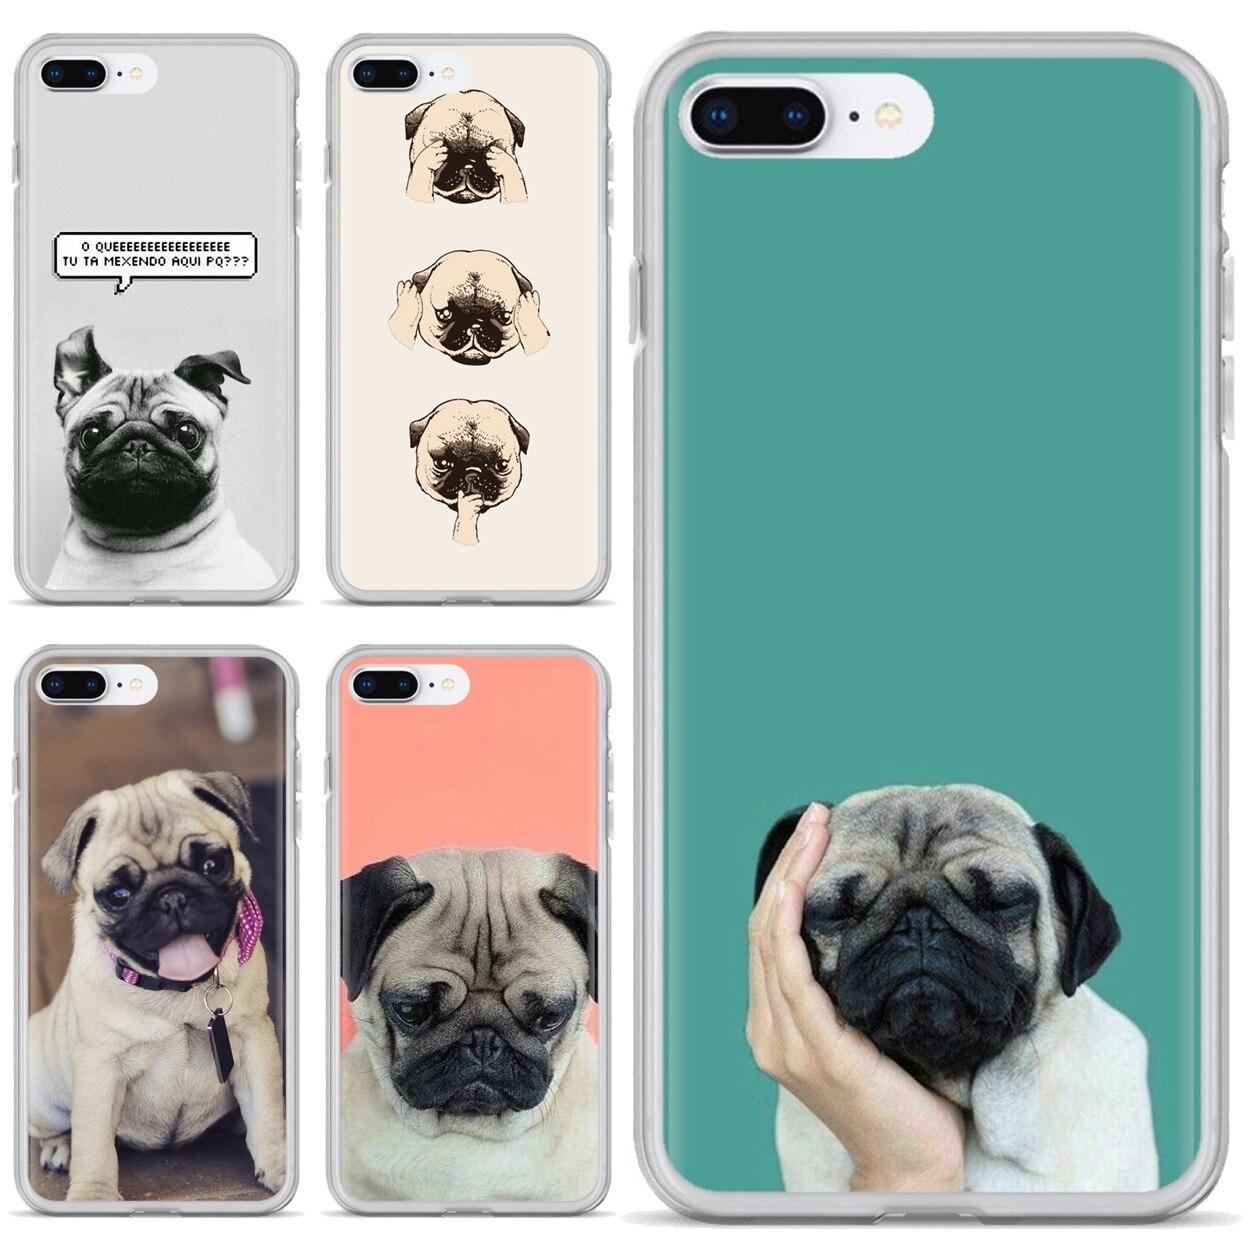 Funda de silicona para Motorola Moto G G2 G3 X4 E4 E5 G5 G5S G6 Z Z2 Z3 C jugar Plus Animal perro estampado